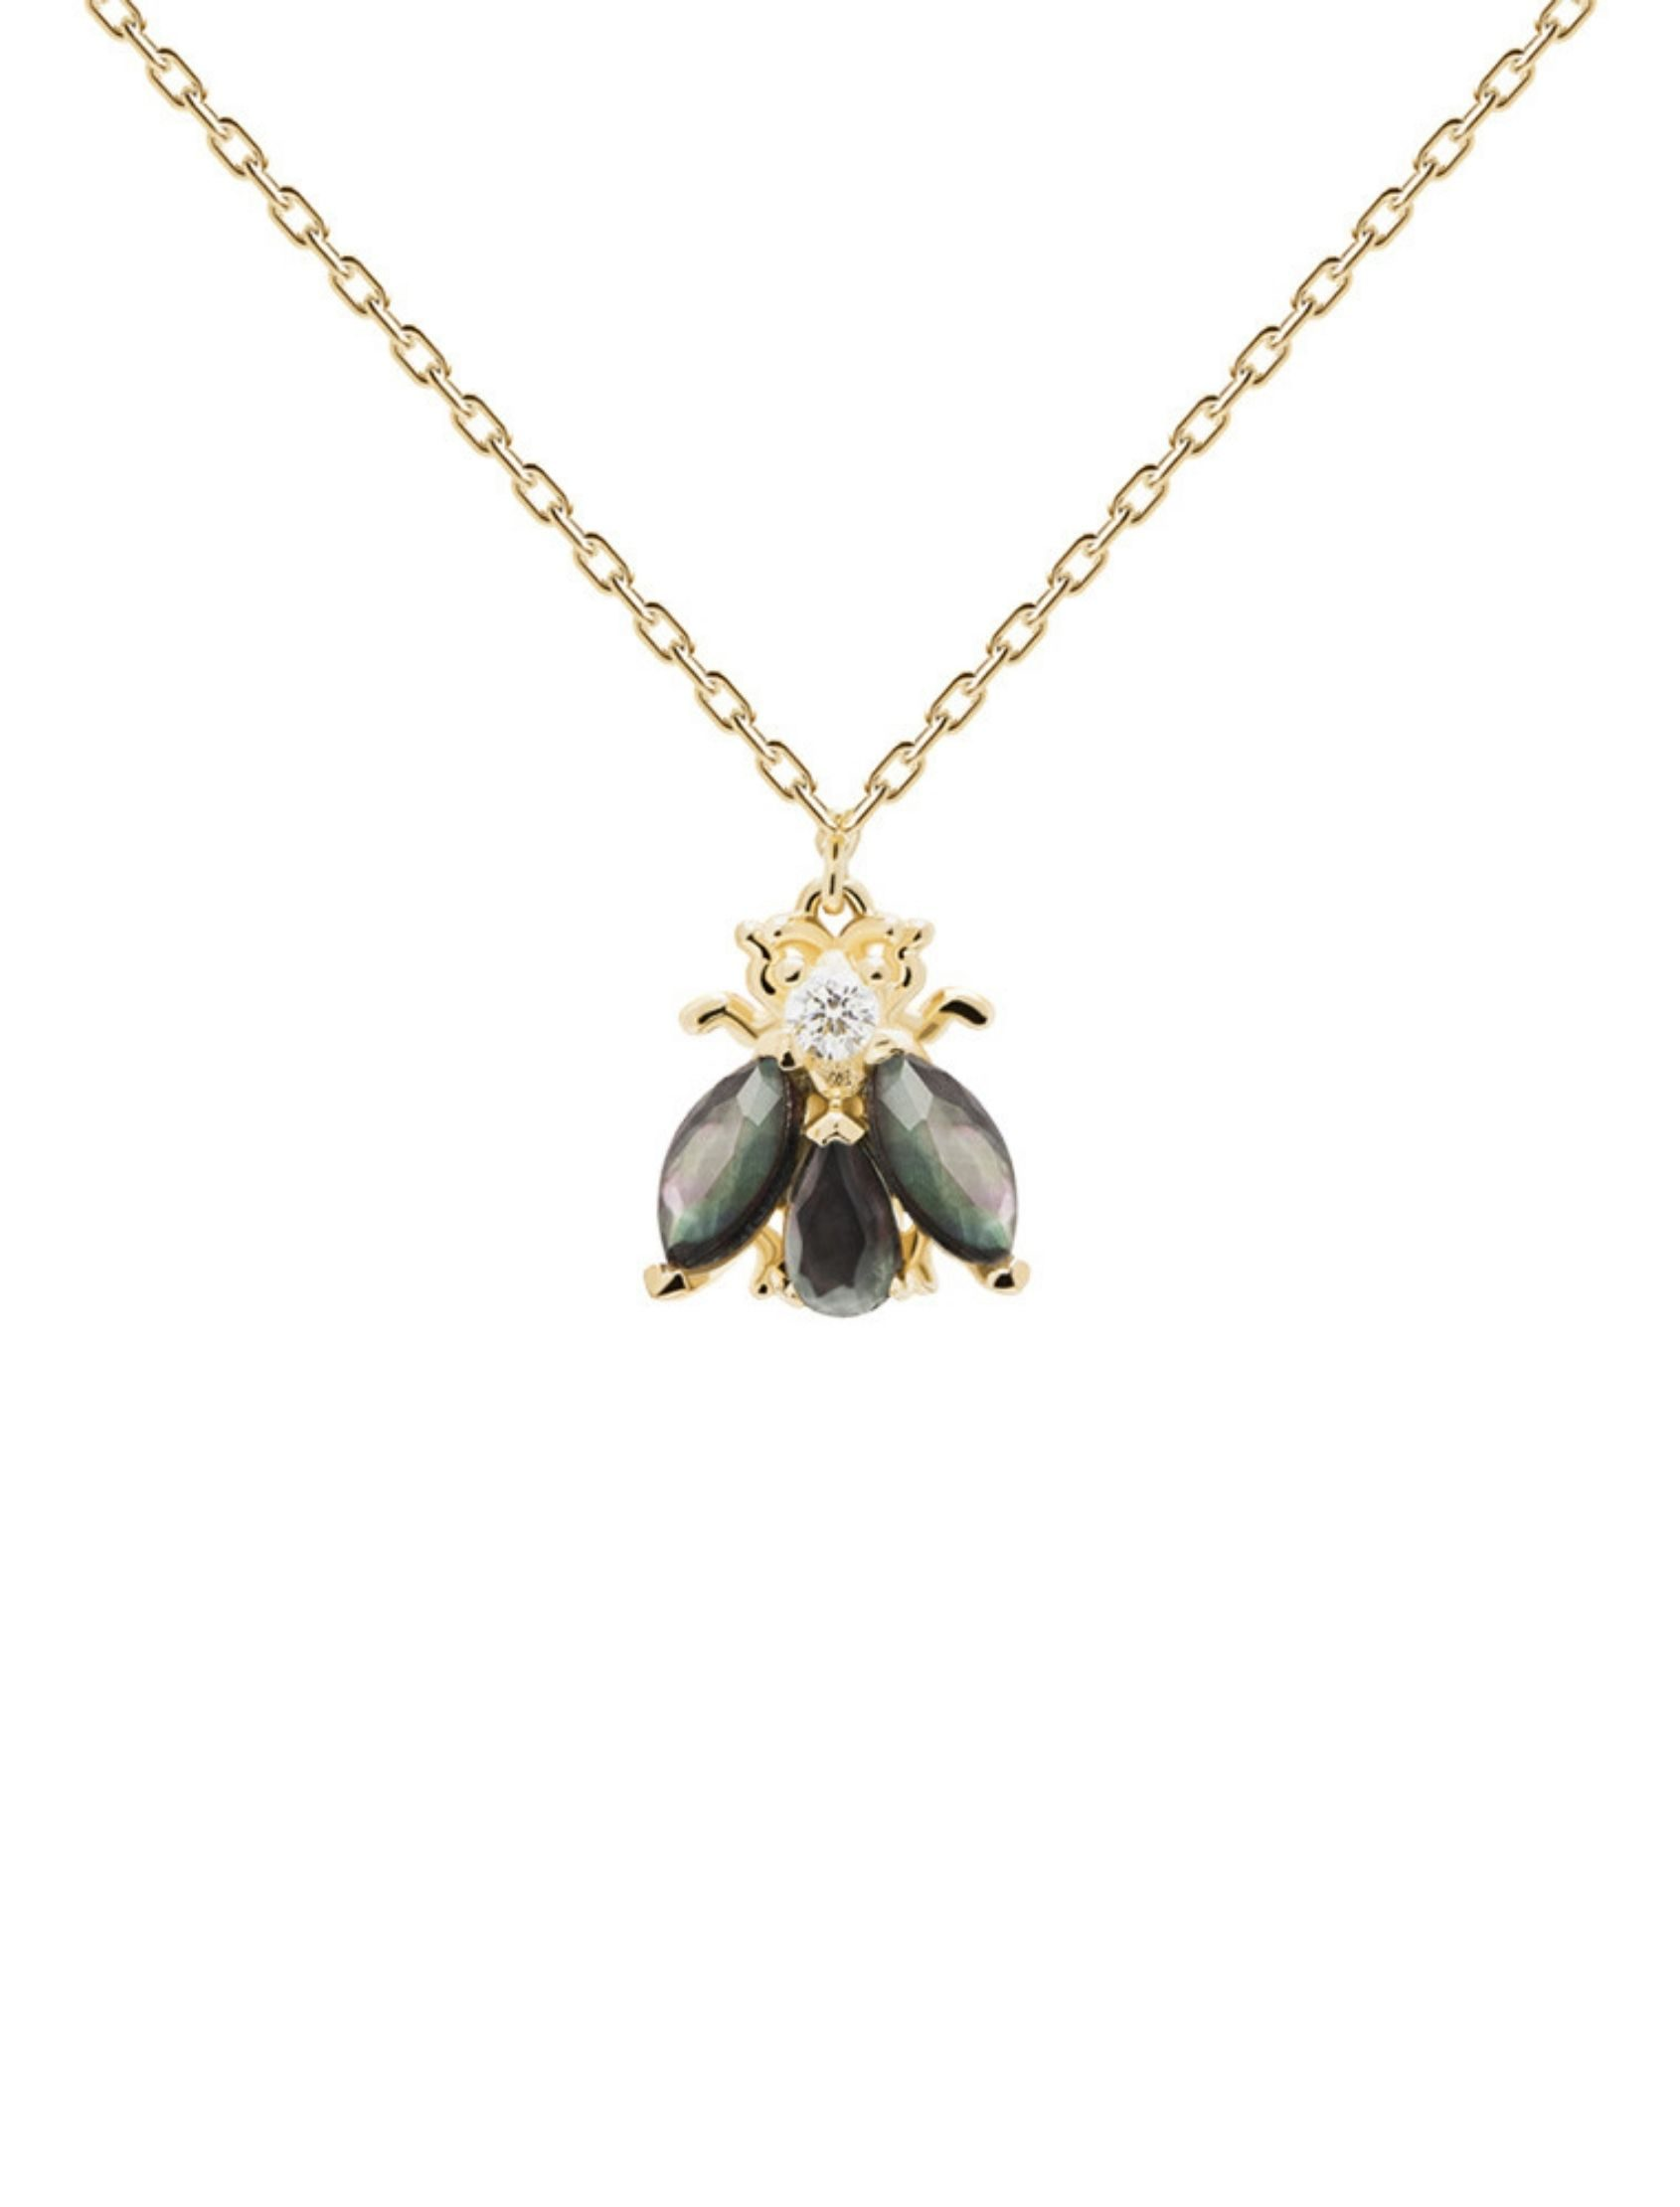 collar zaza oro con circonitas inspirado en los virtuosos insectos voladores